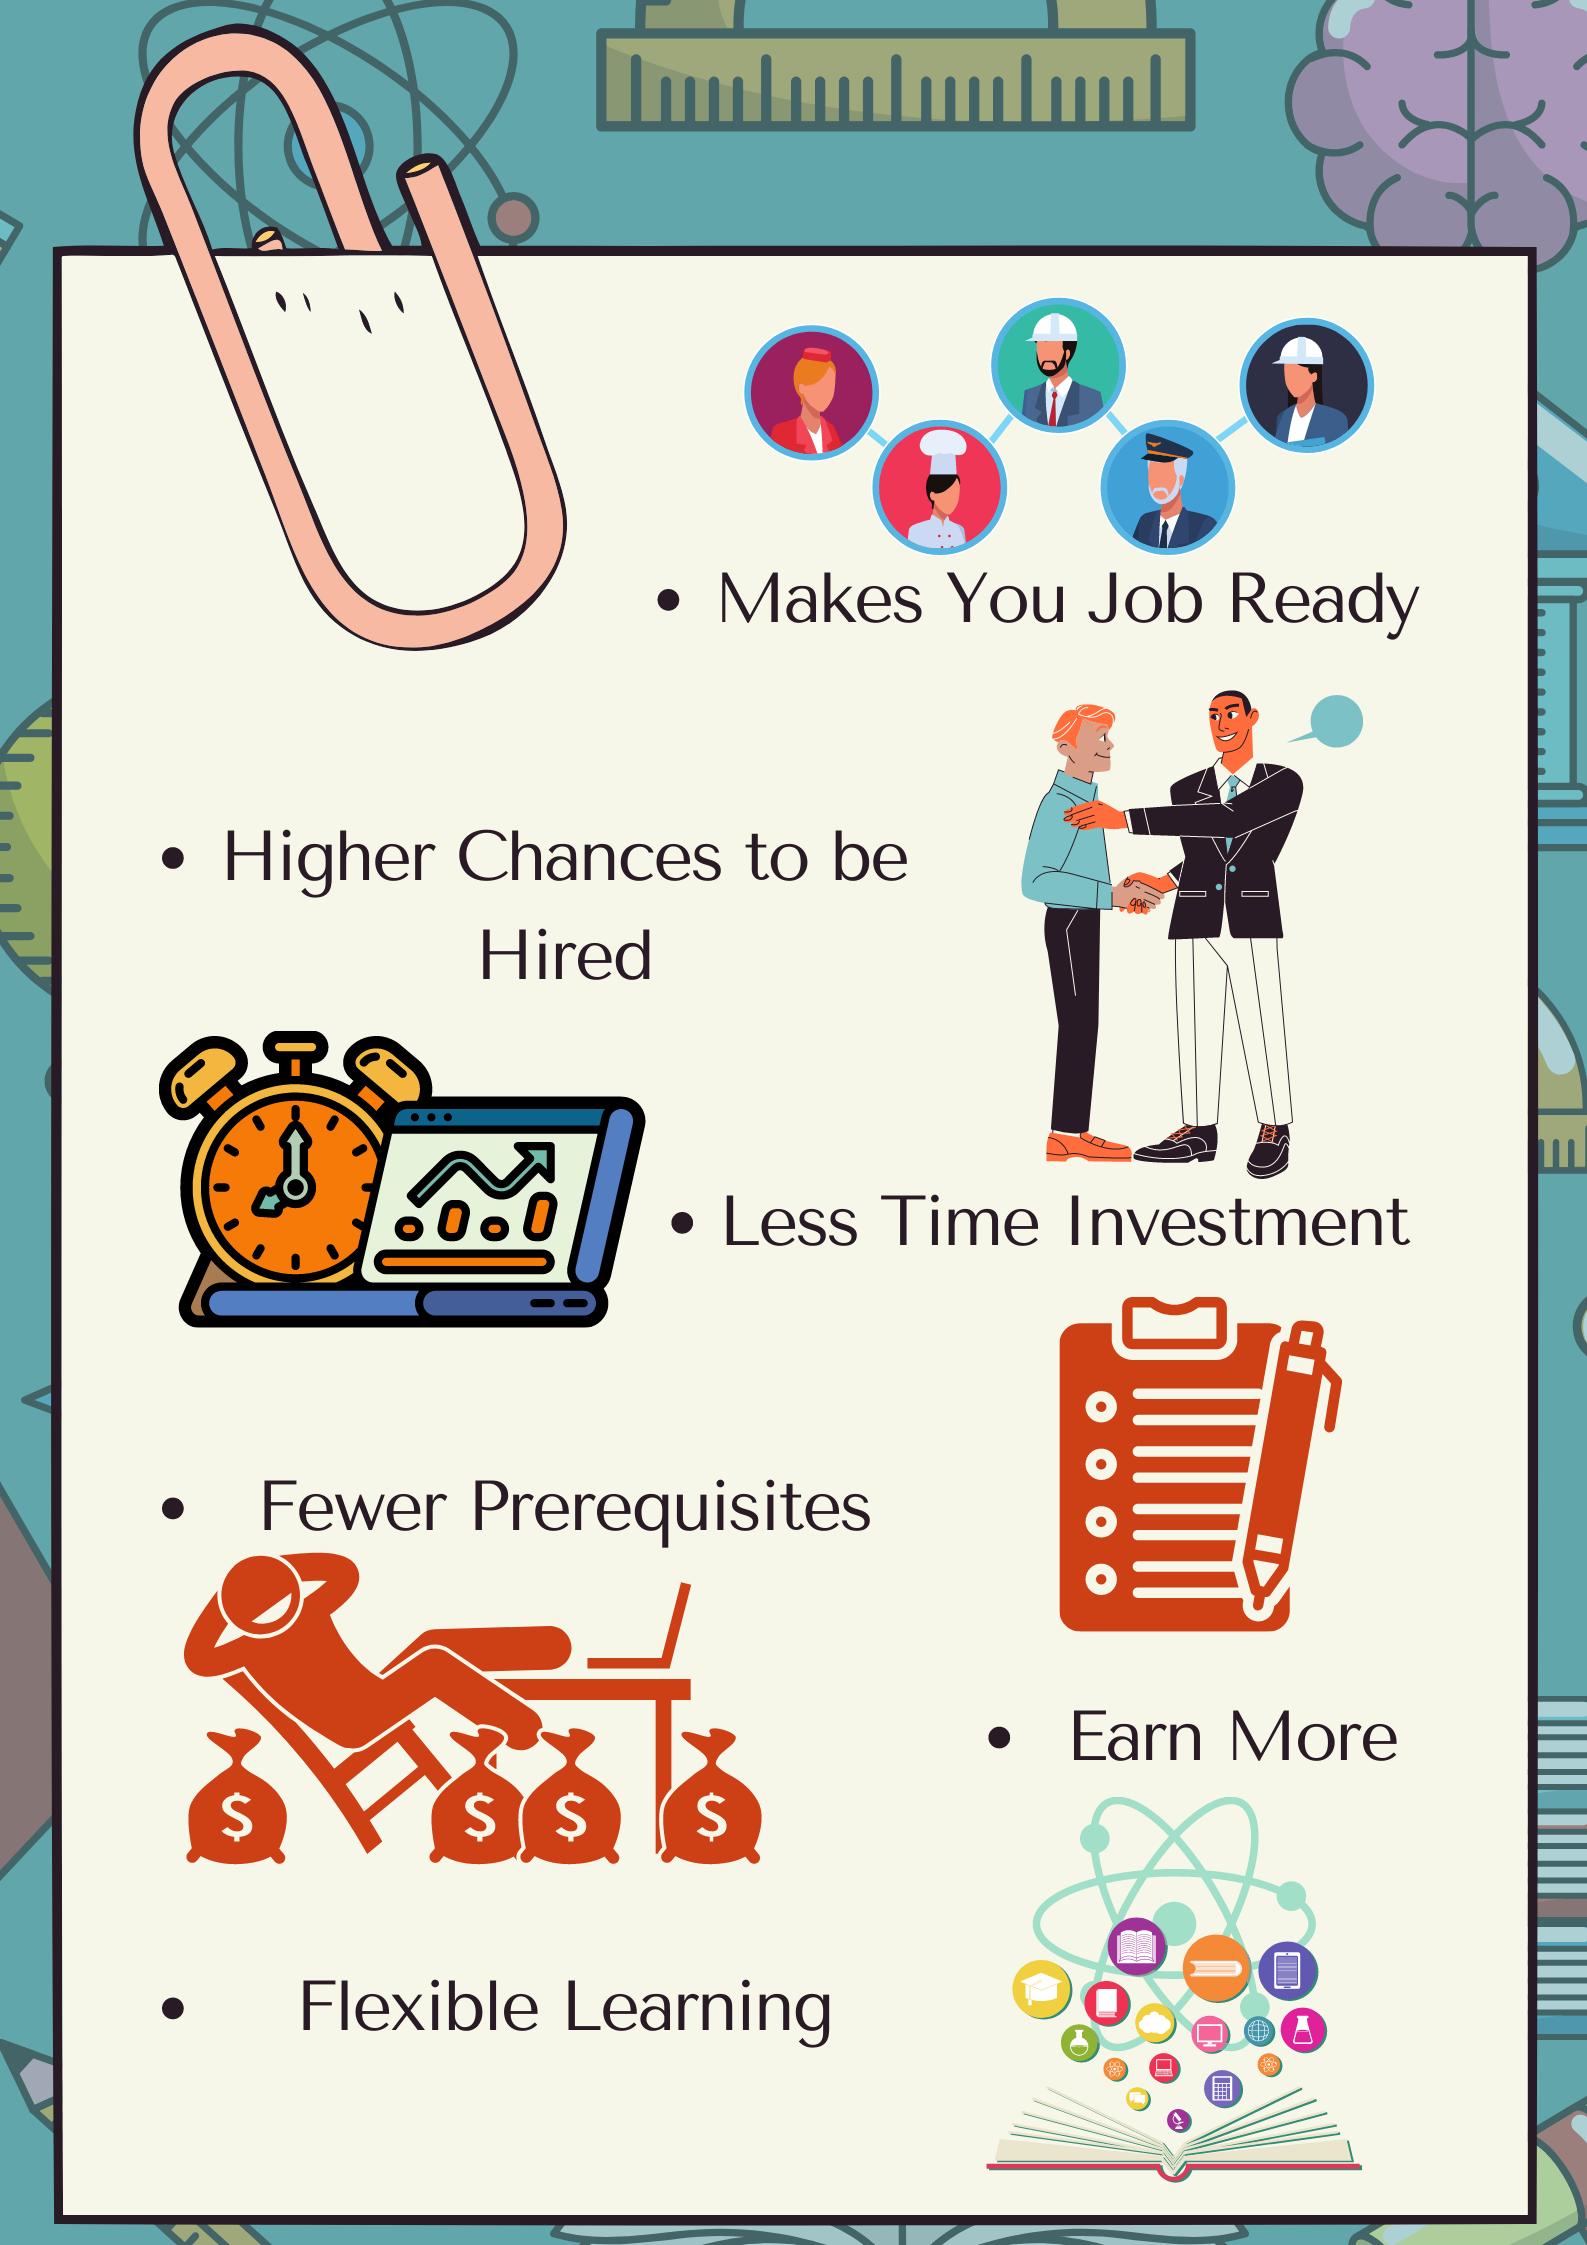 Makes-You-Job-Ready